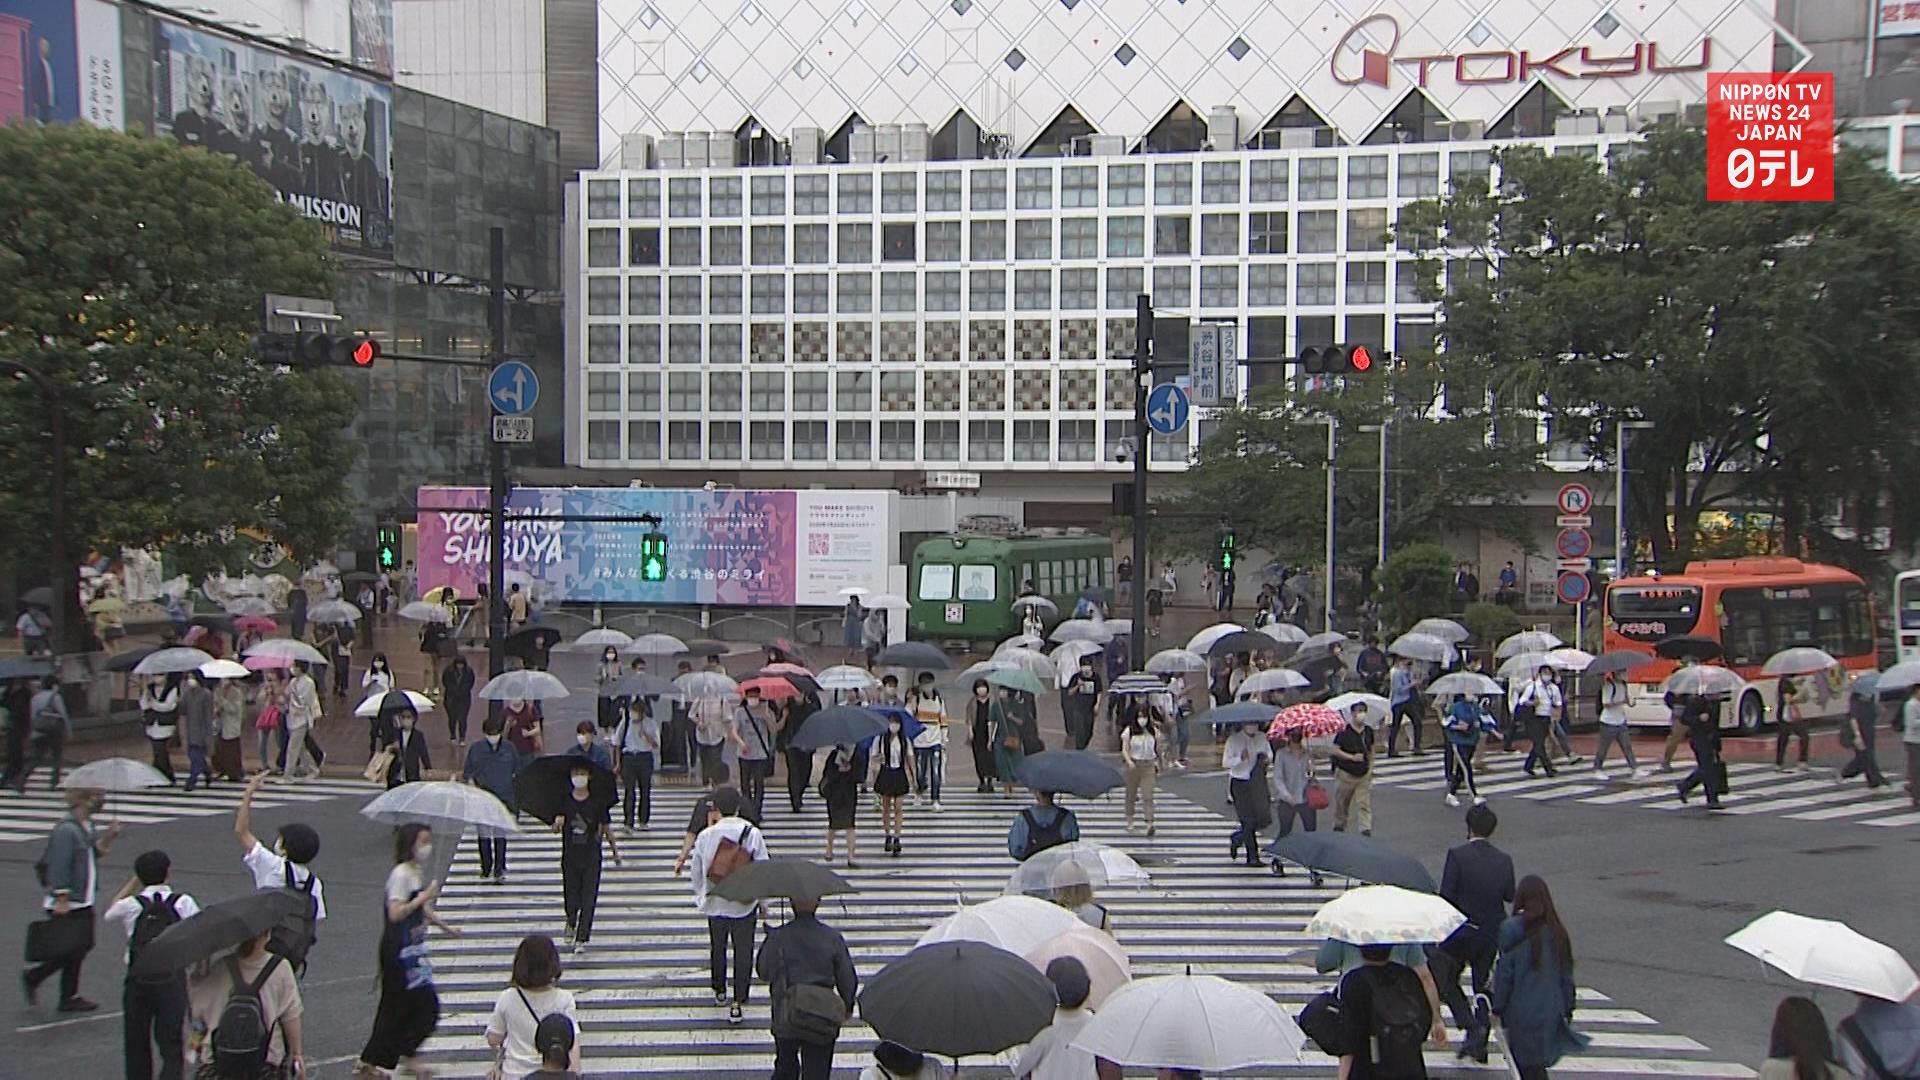 Tokyo raises coronavirus alert to highest level